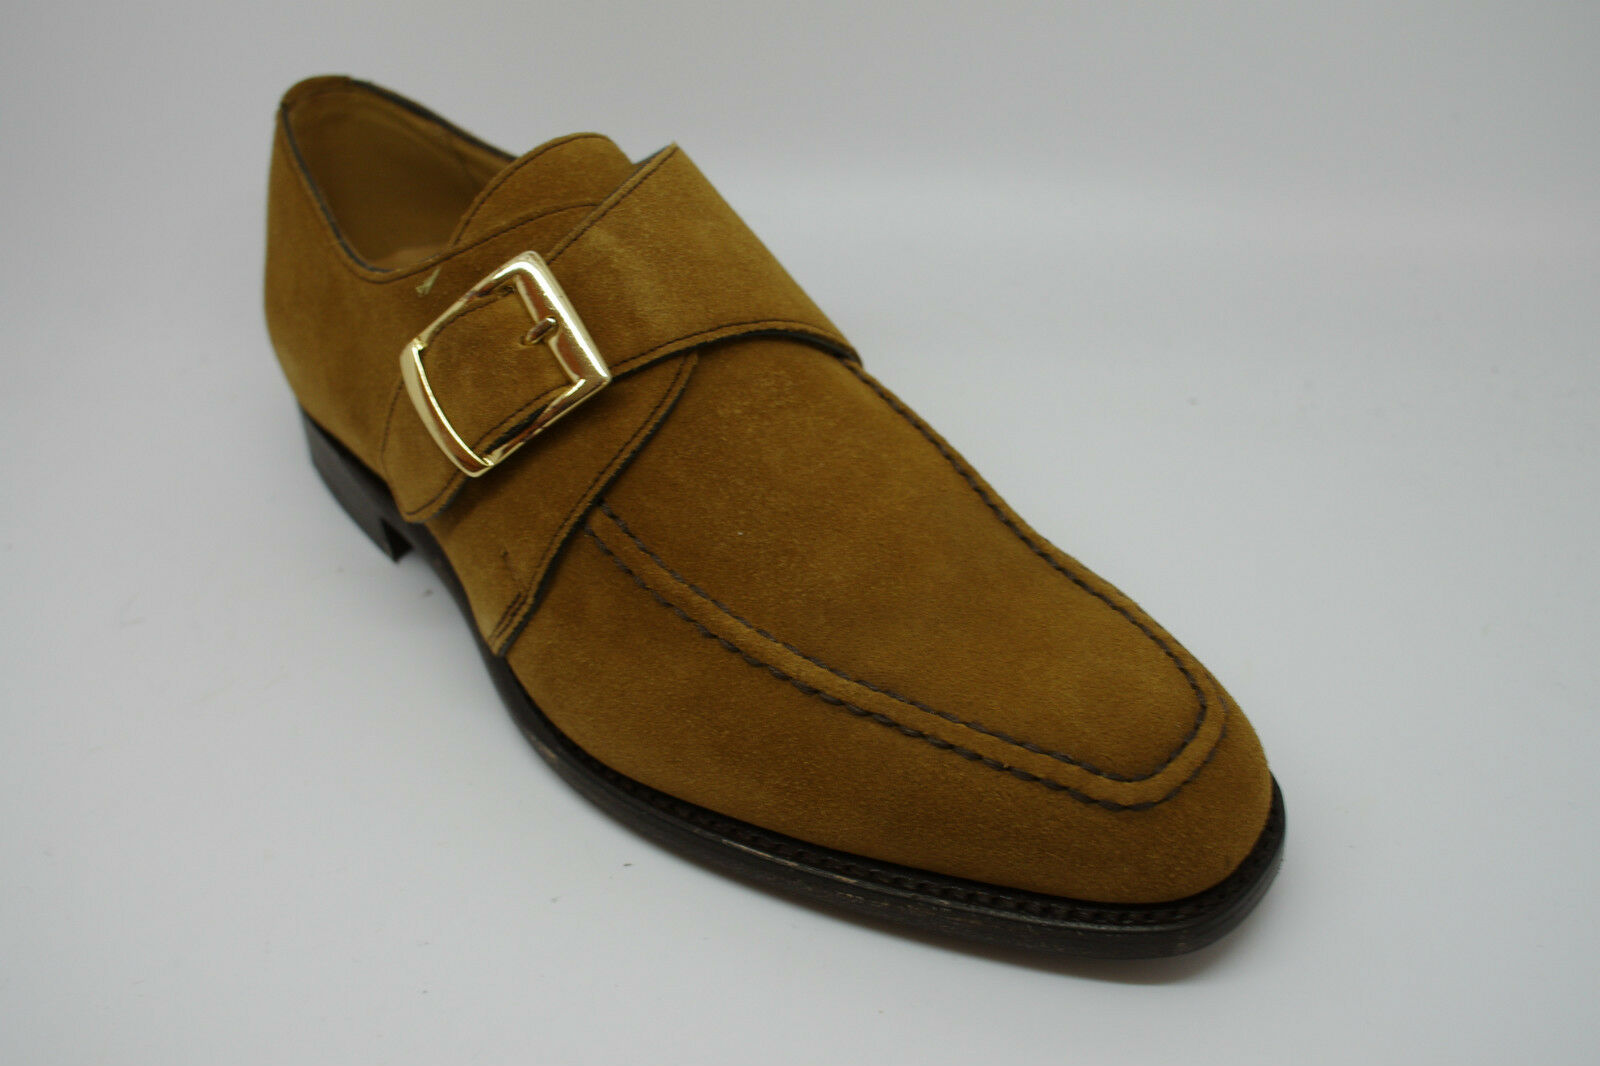 Barker Cannon Monje Zapatos en ante UK 6 FX de mostaza